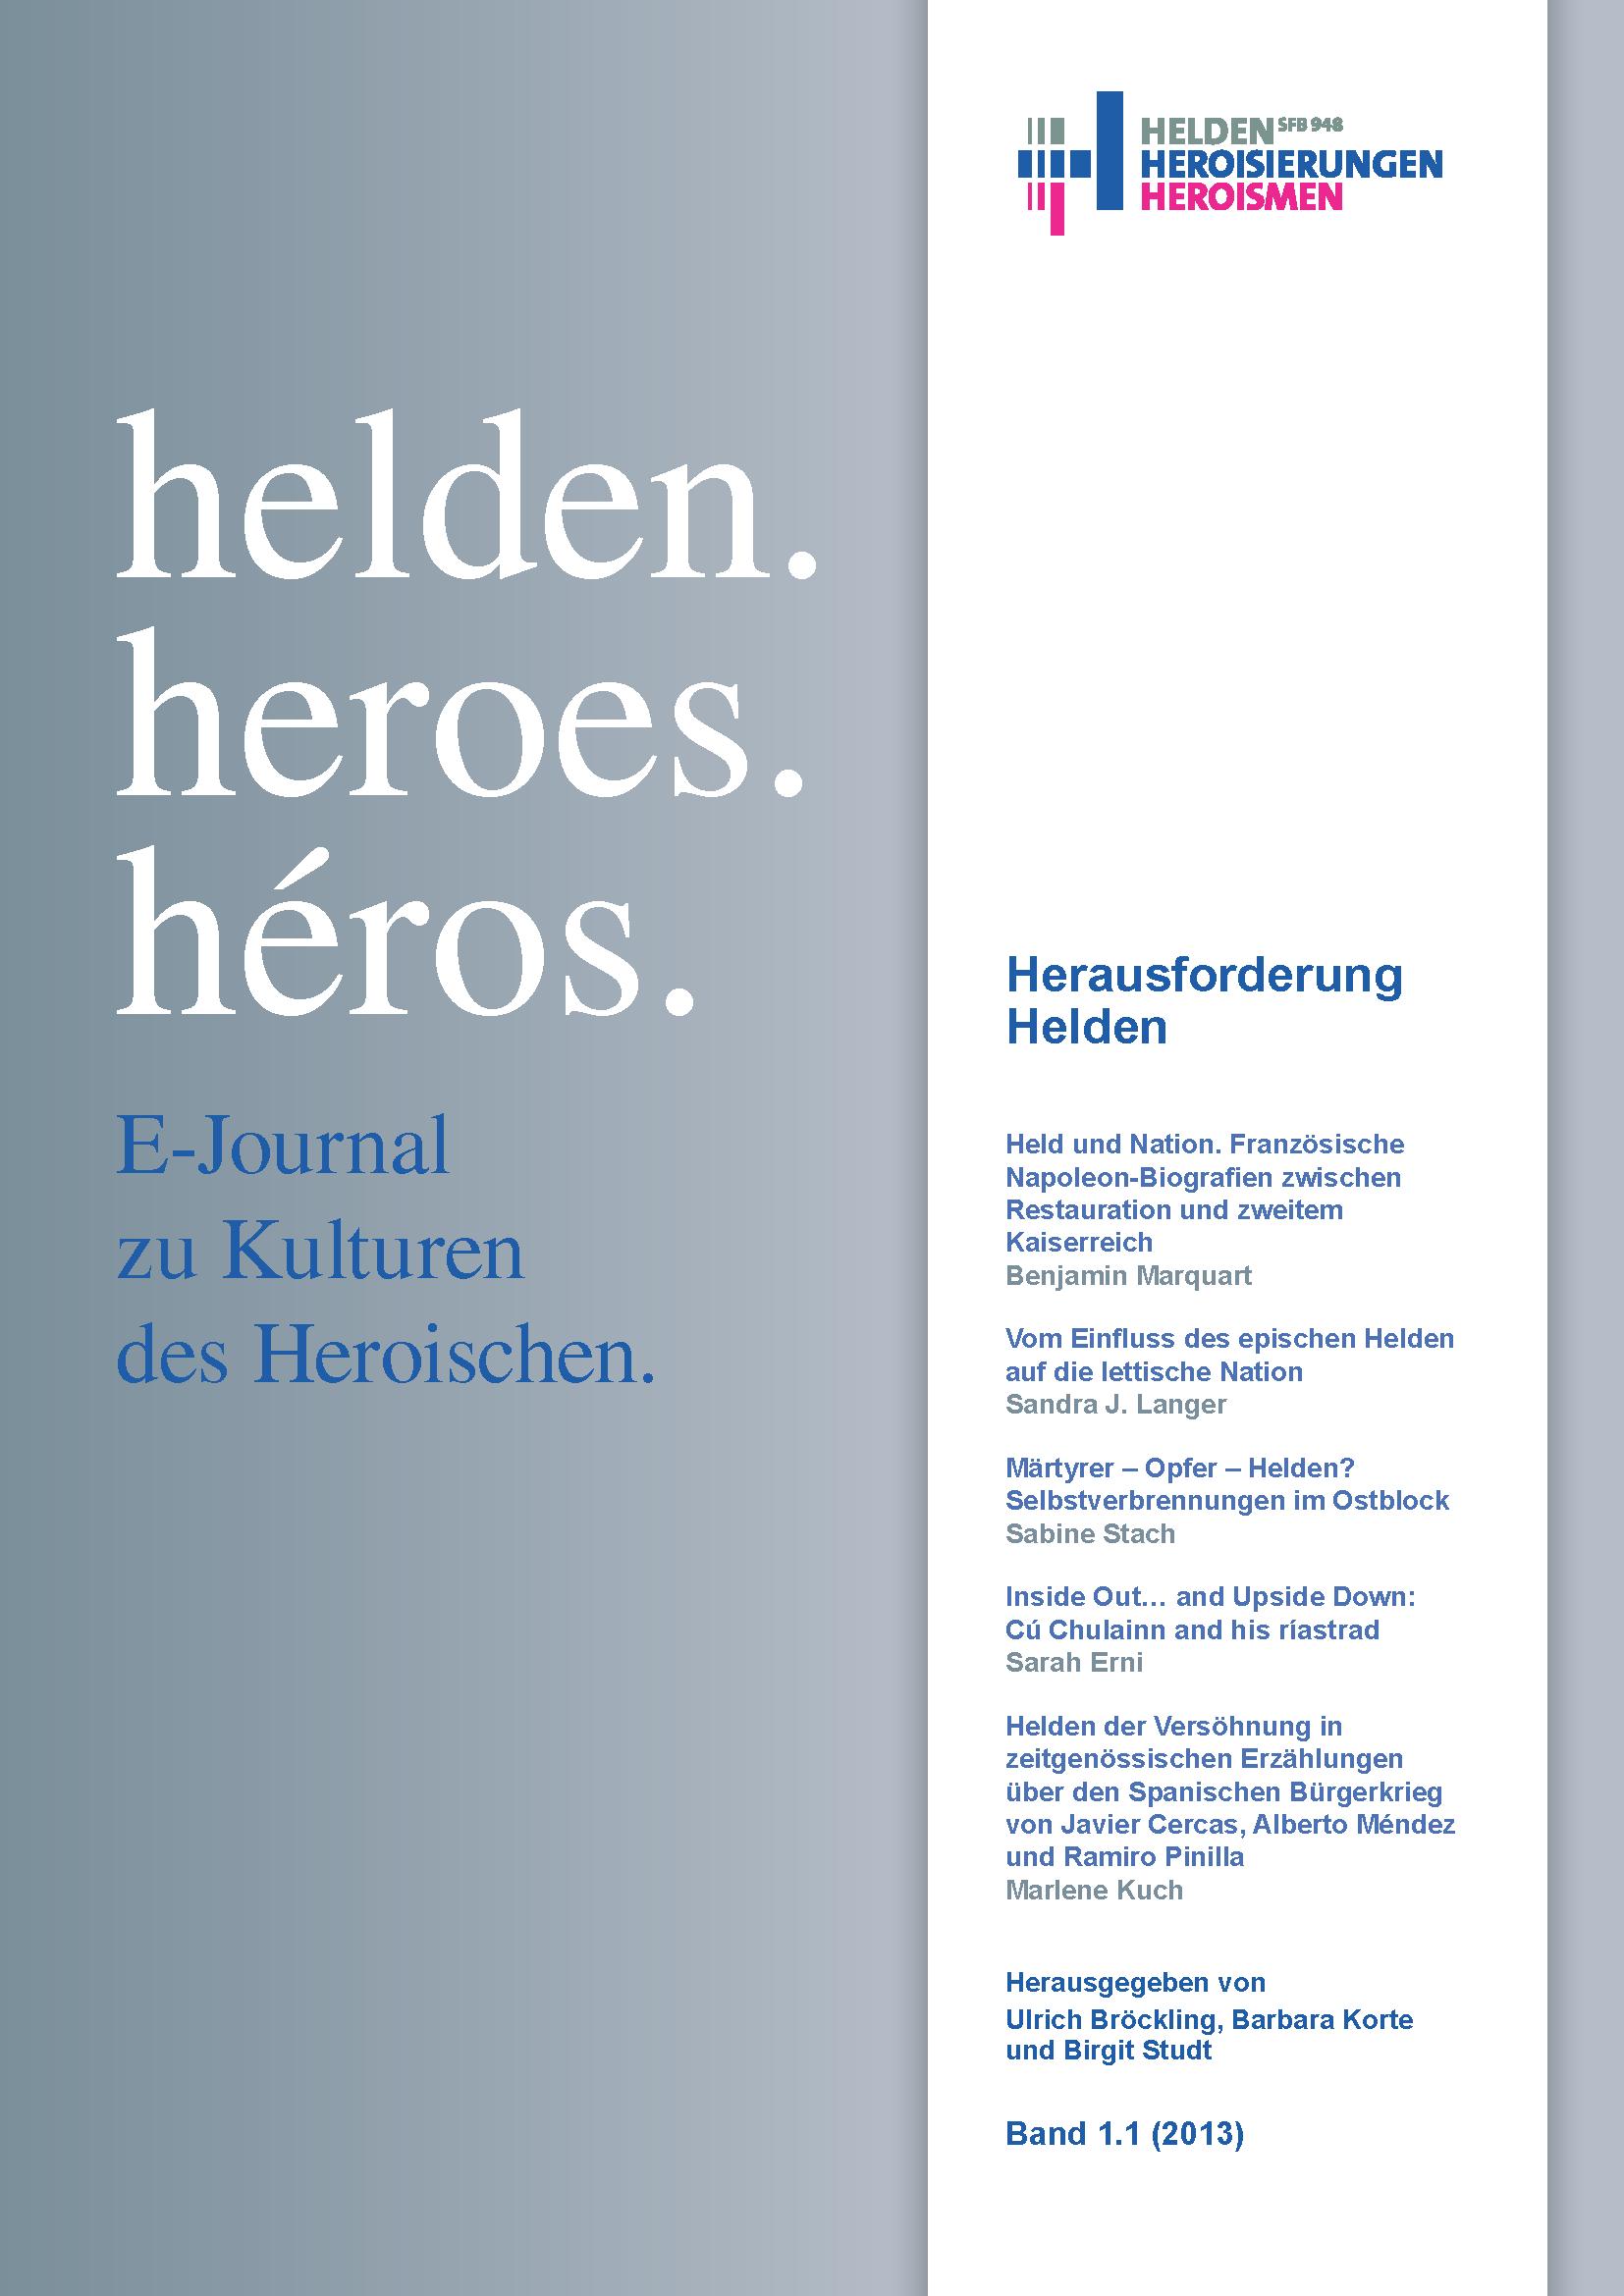 Herausforderung Helden